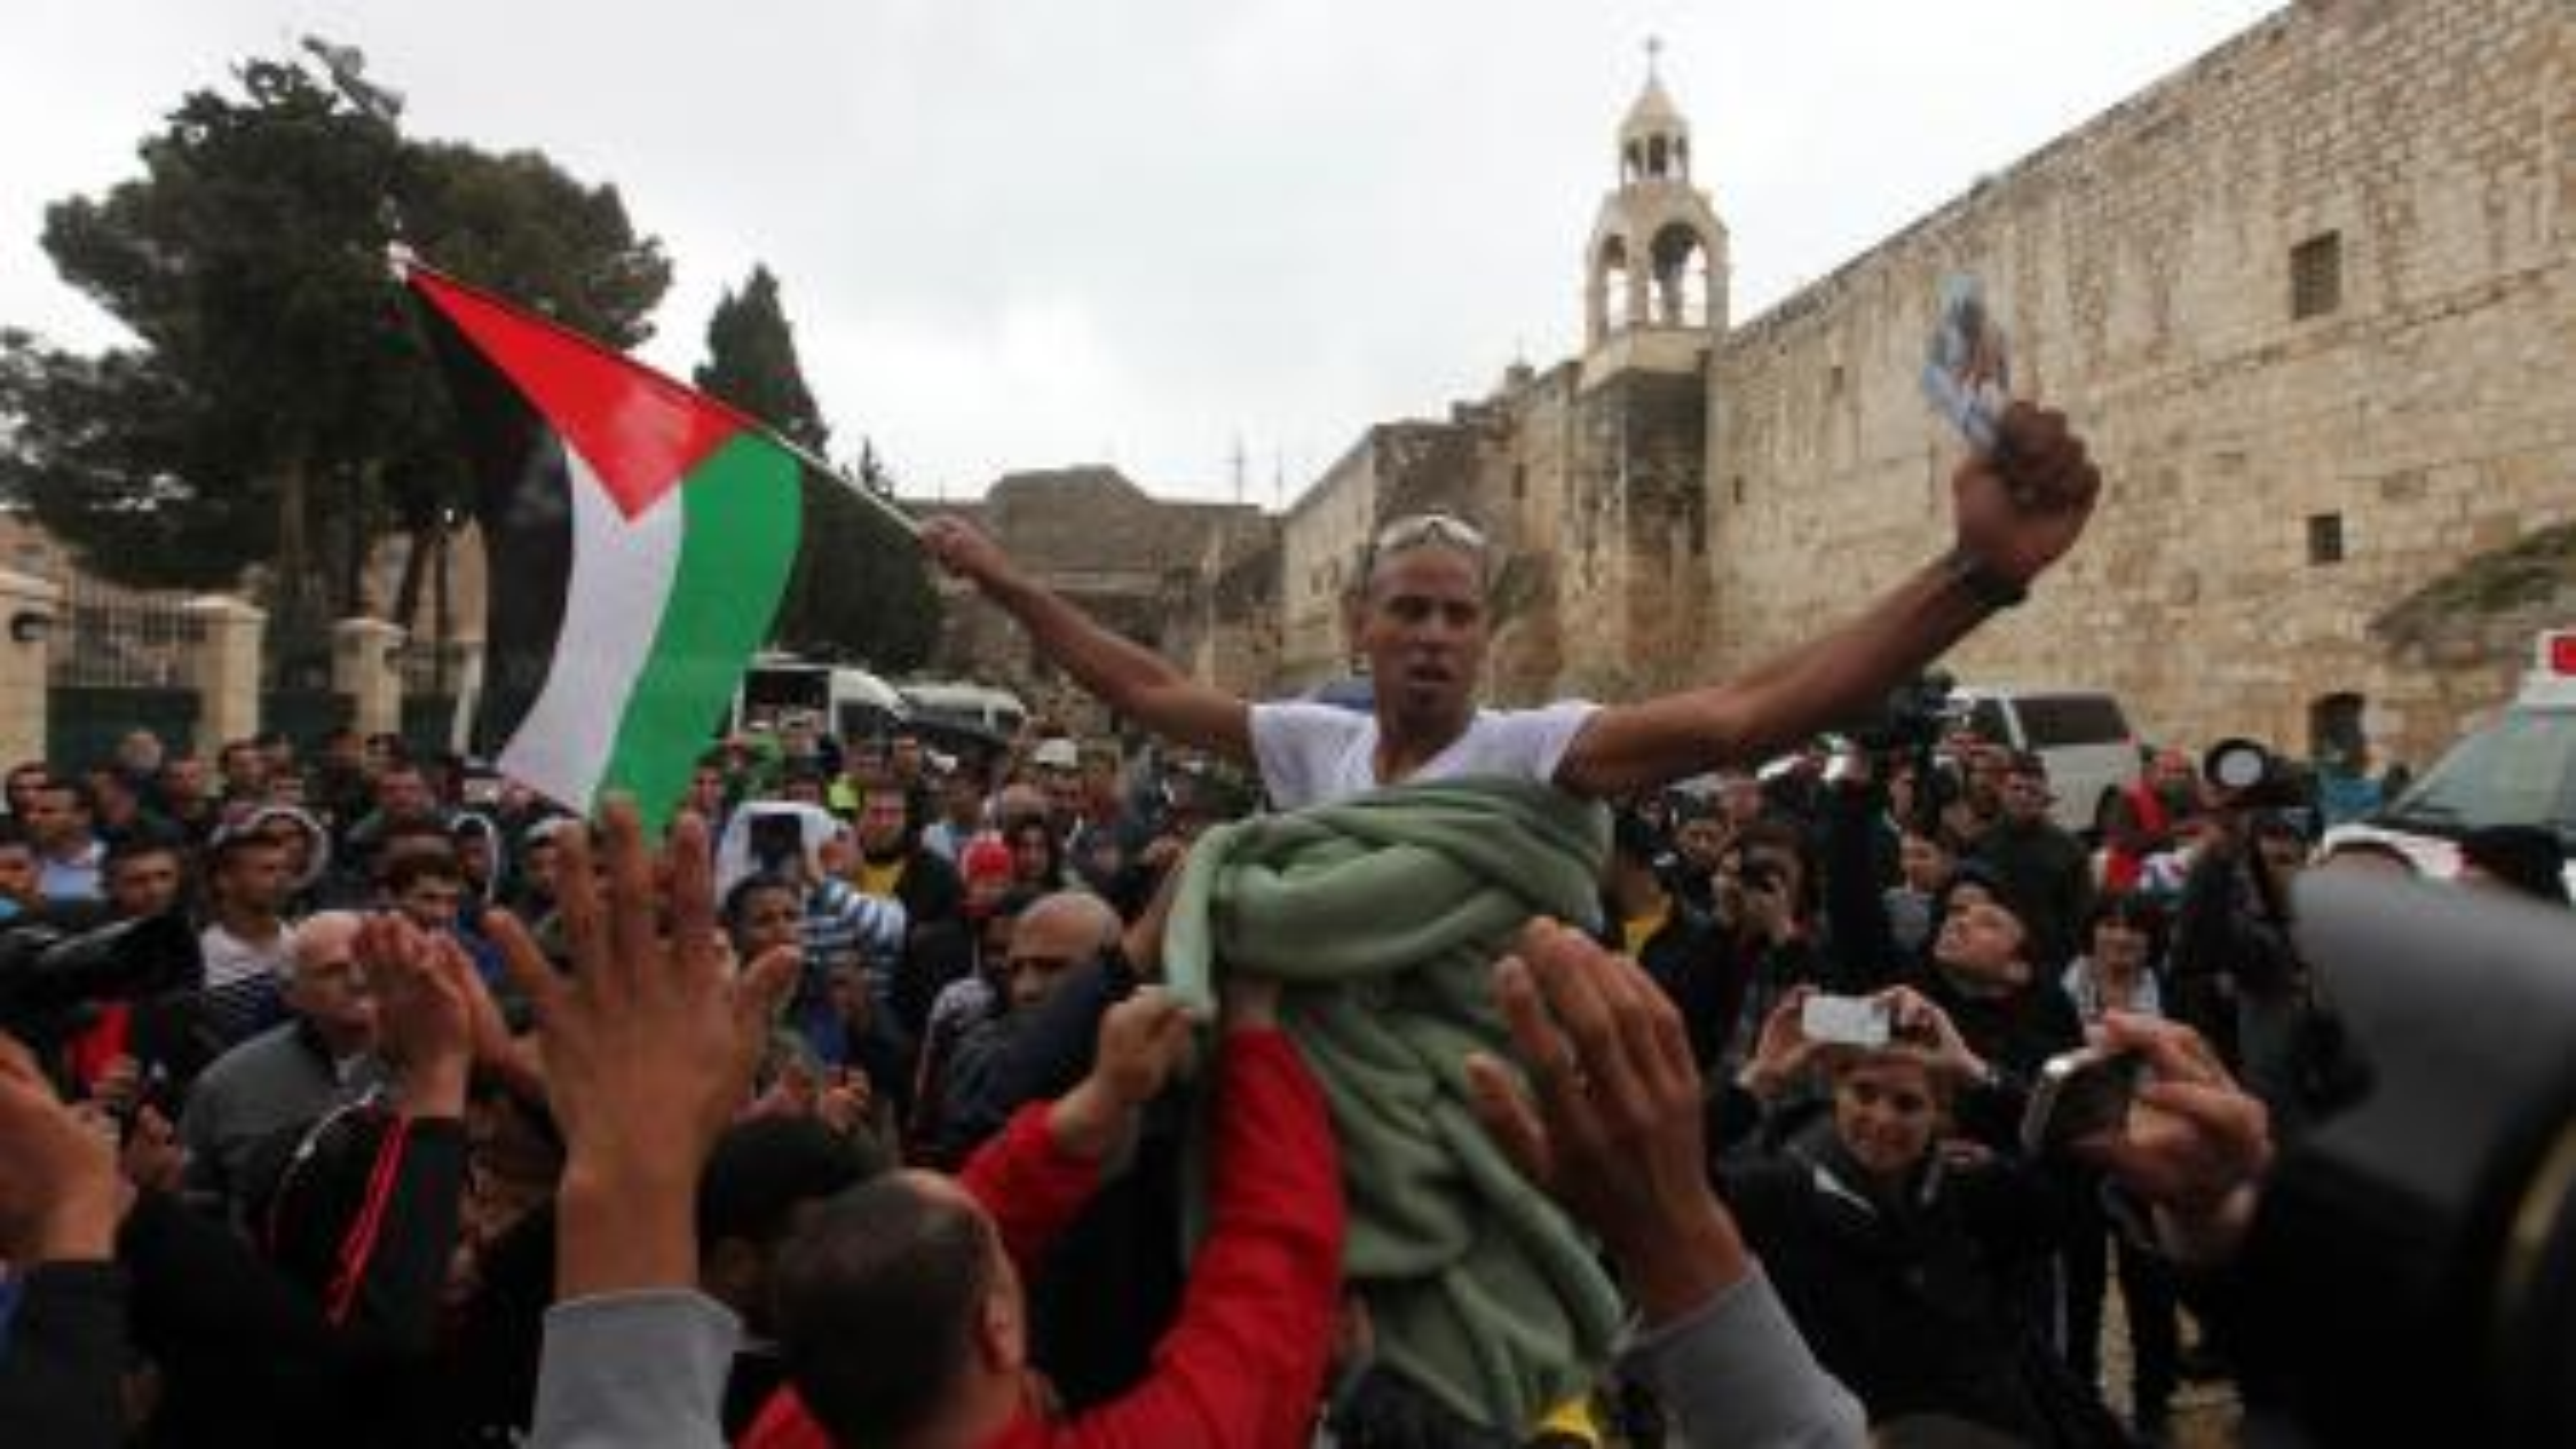 Abdel Nasser Awajme celebrating his win at the Bethlehem Marathon.